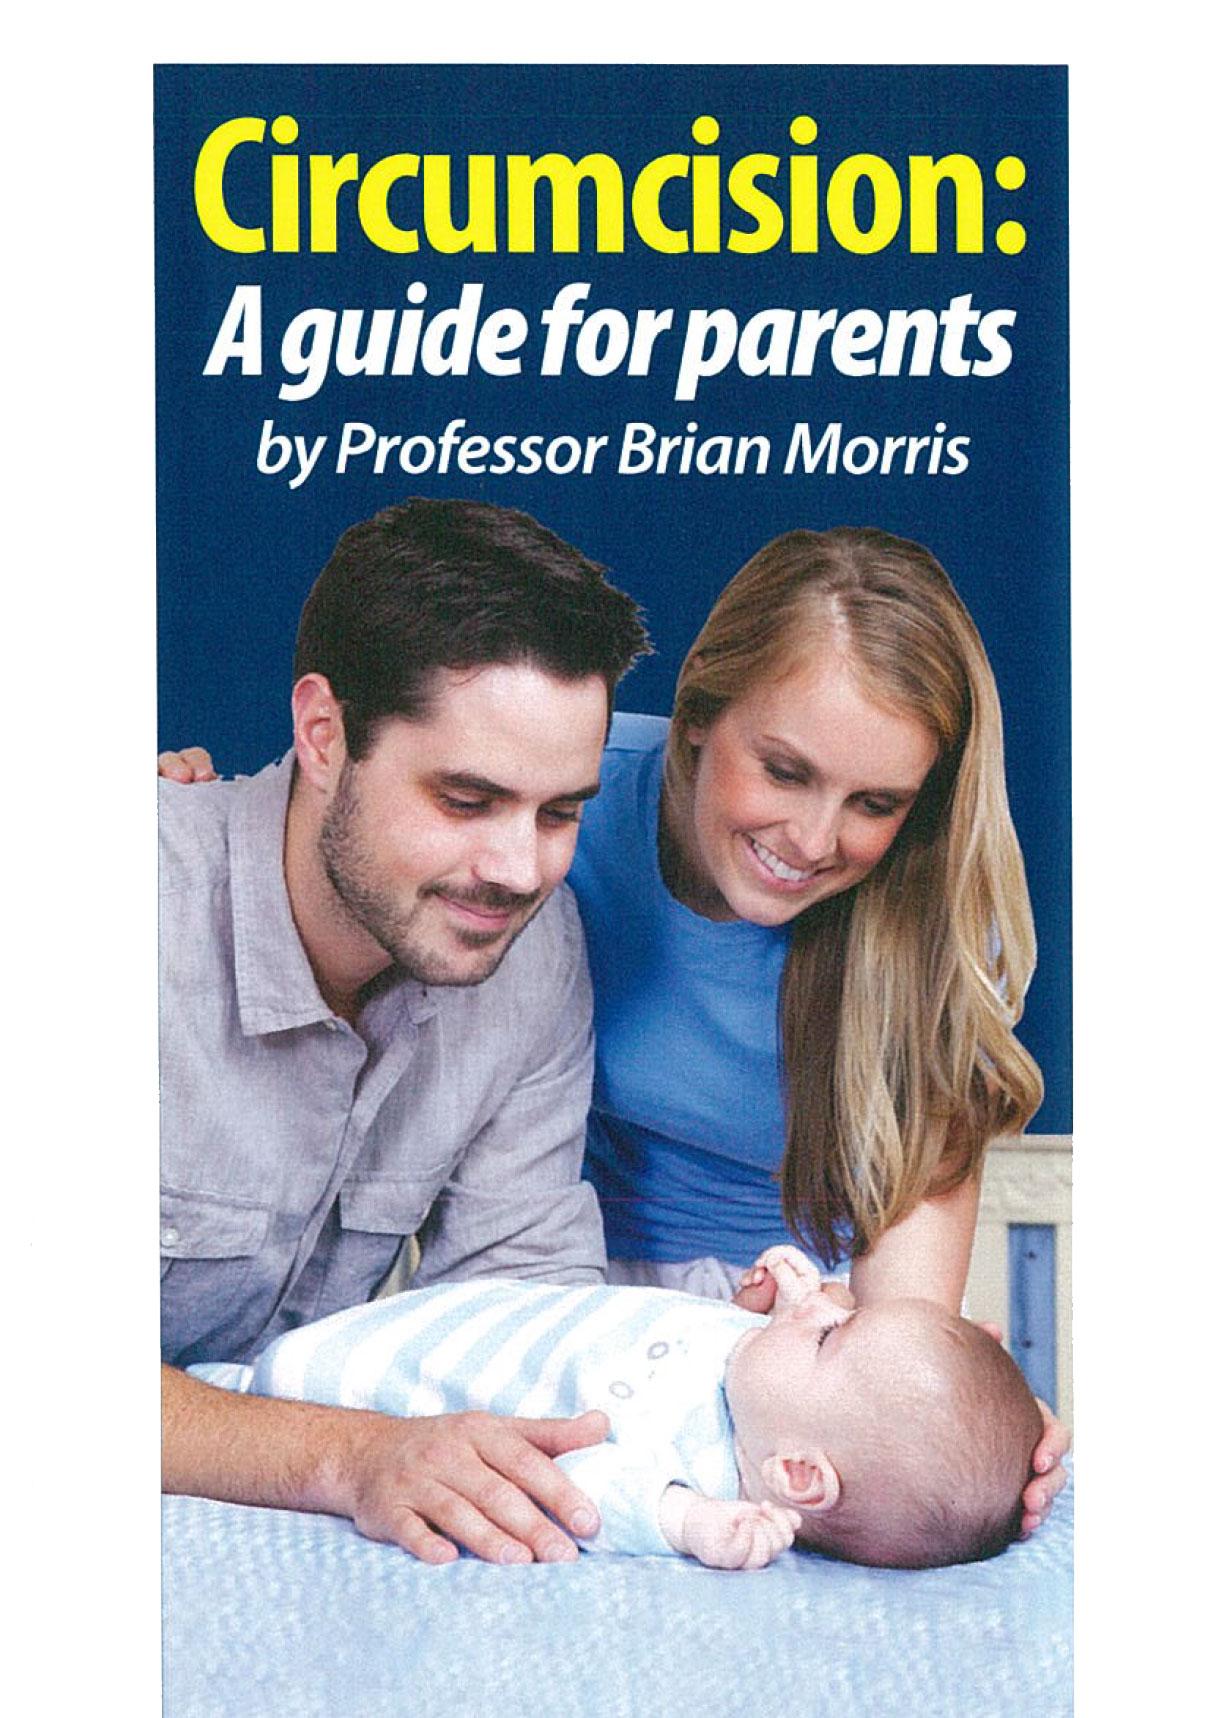 Circumcision a Guide for Parents